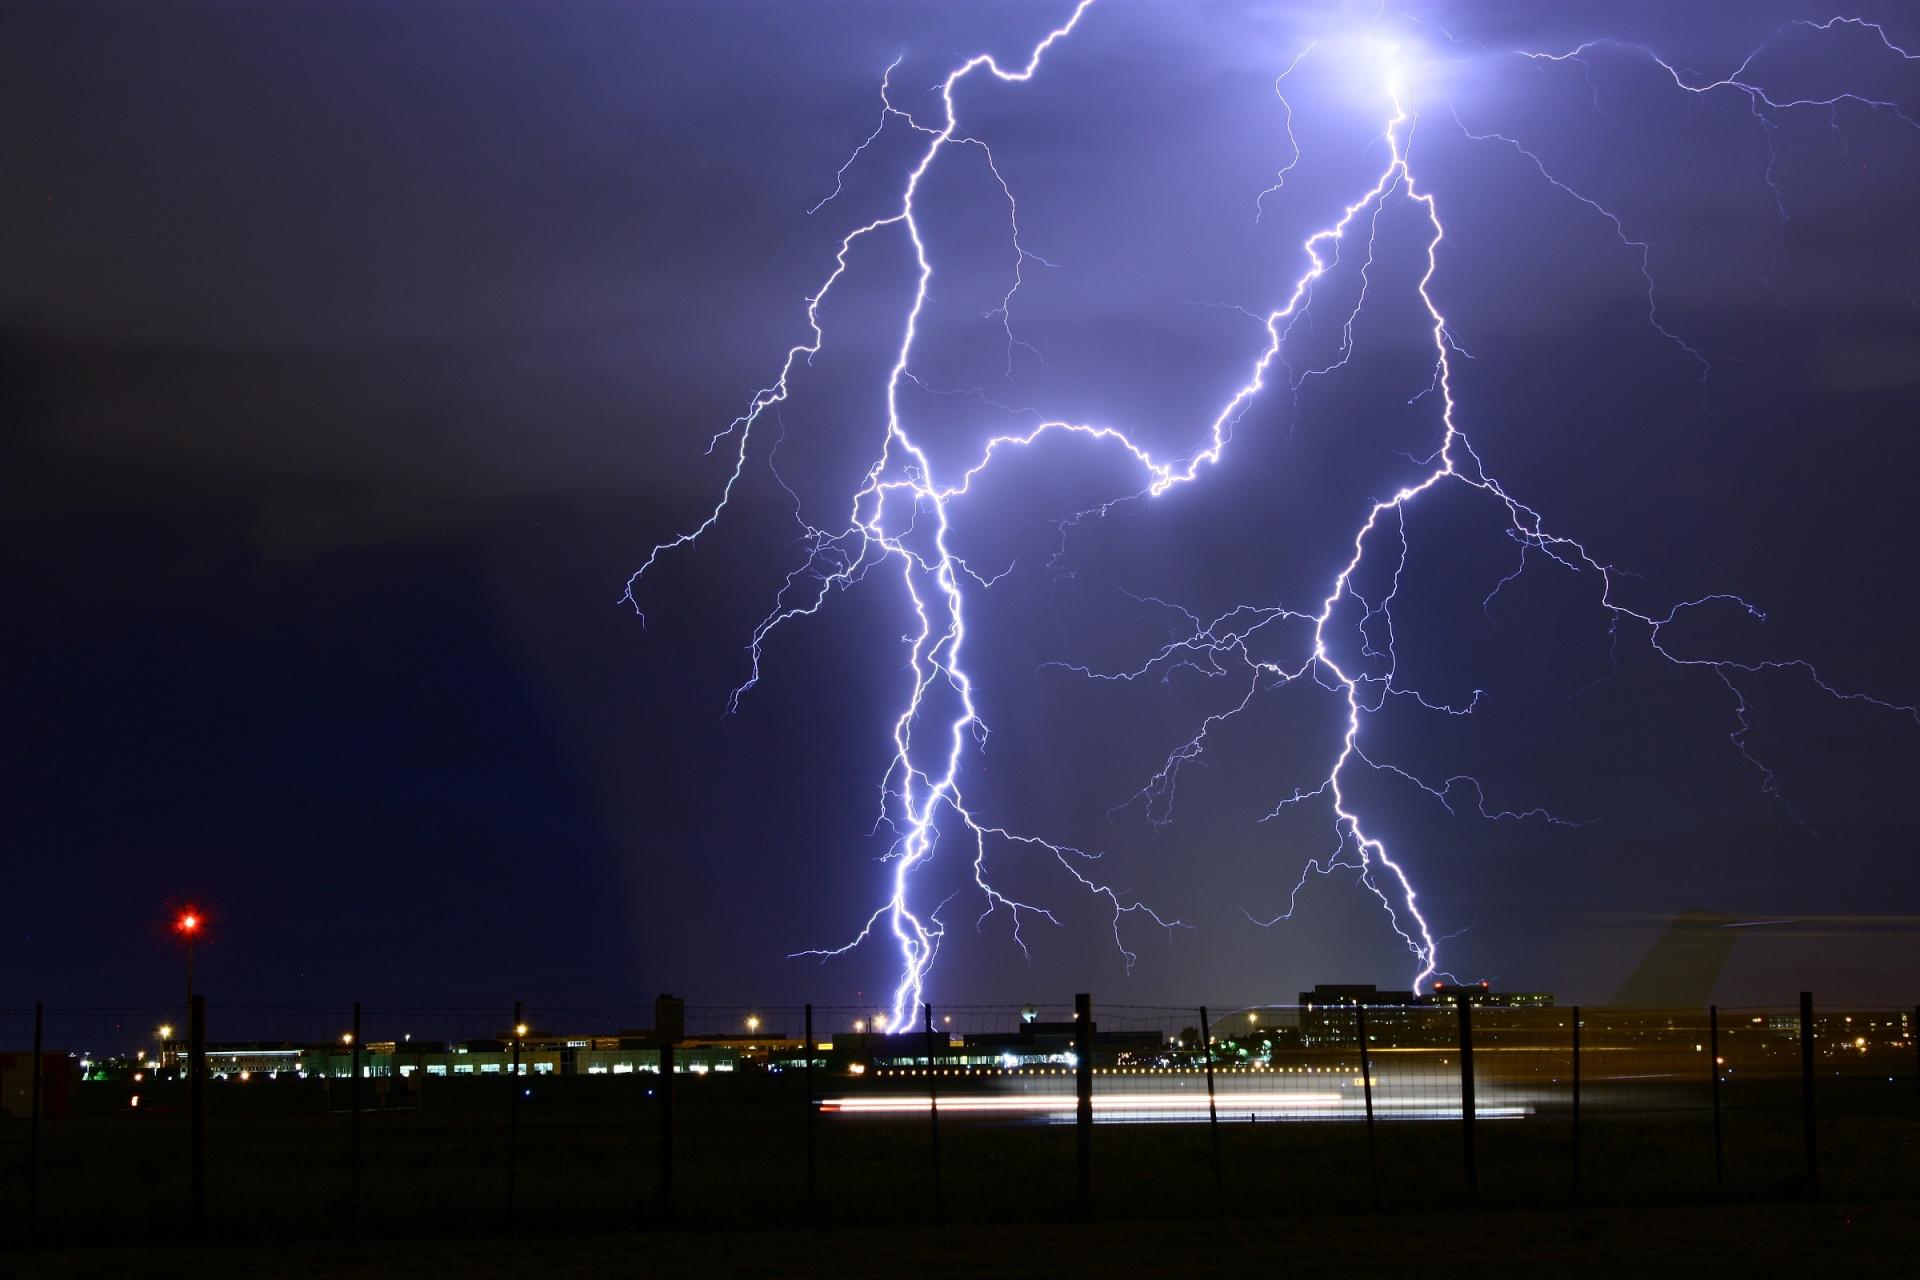 Scatta l'allerta meteo: vortice ciclonico in arrivo. Le regi